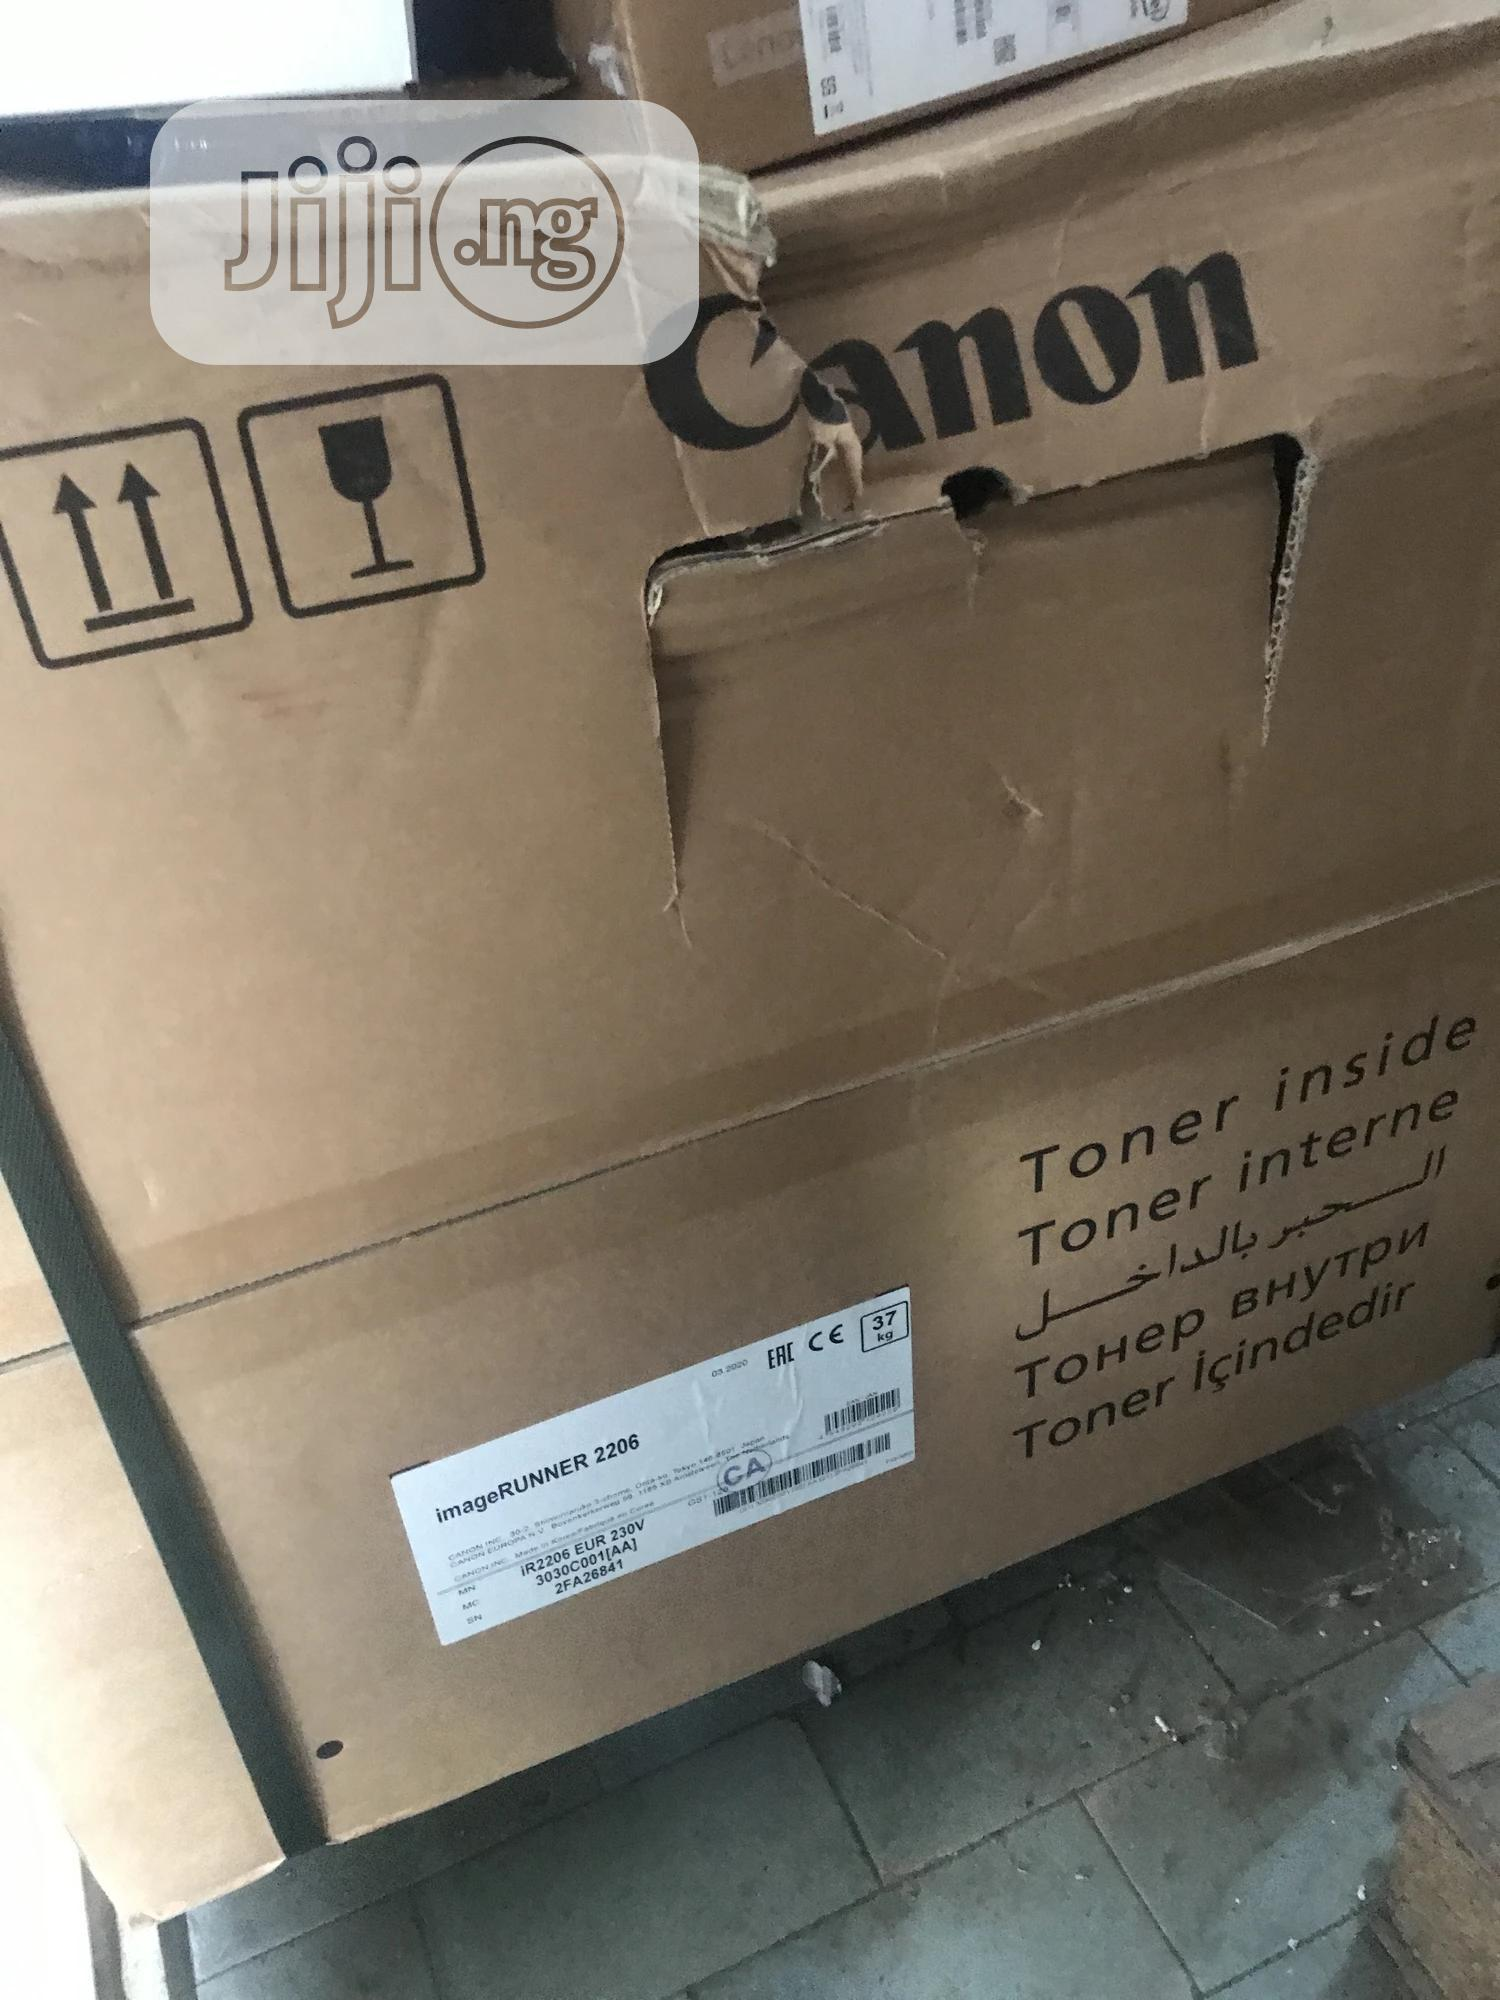 CANON Imagerunner 2206 Multifunction Printer